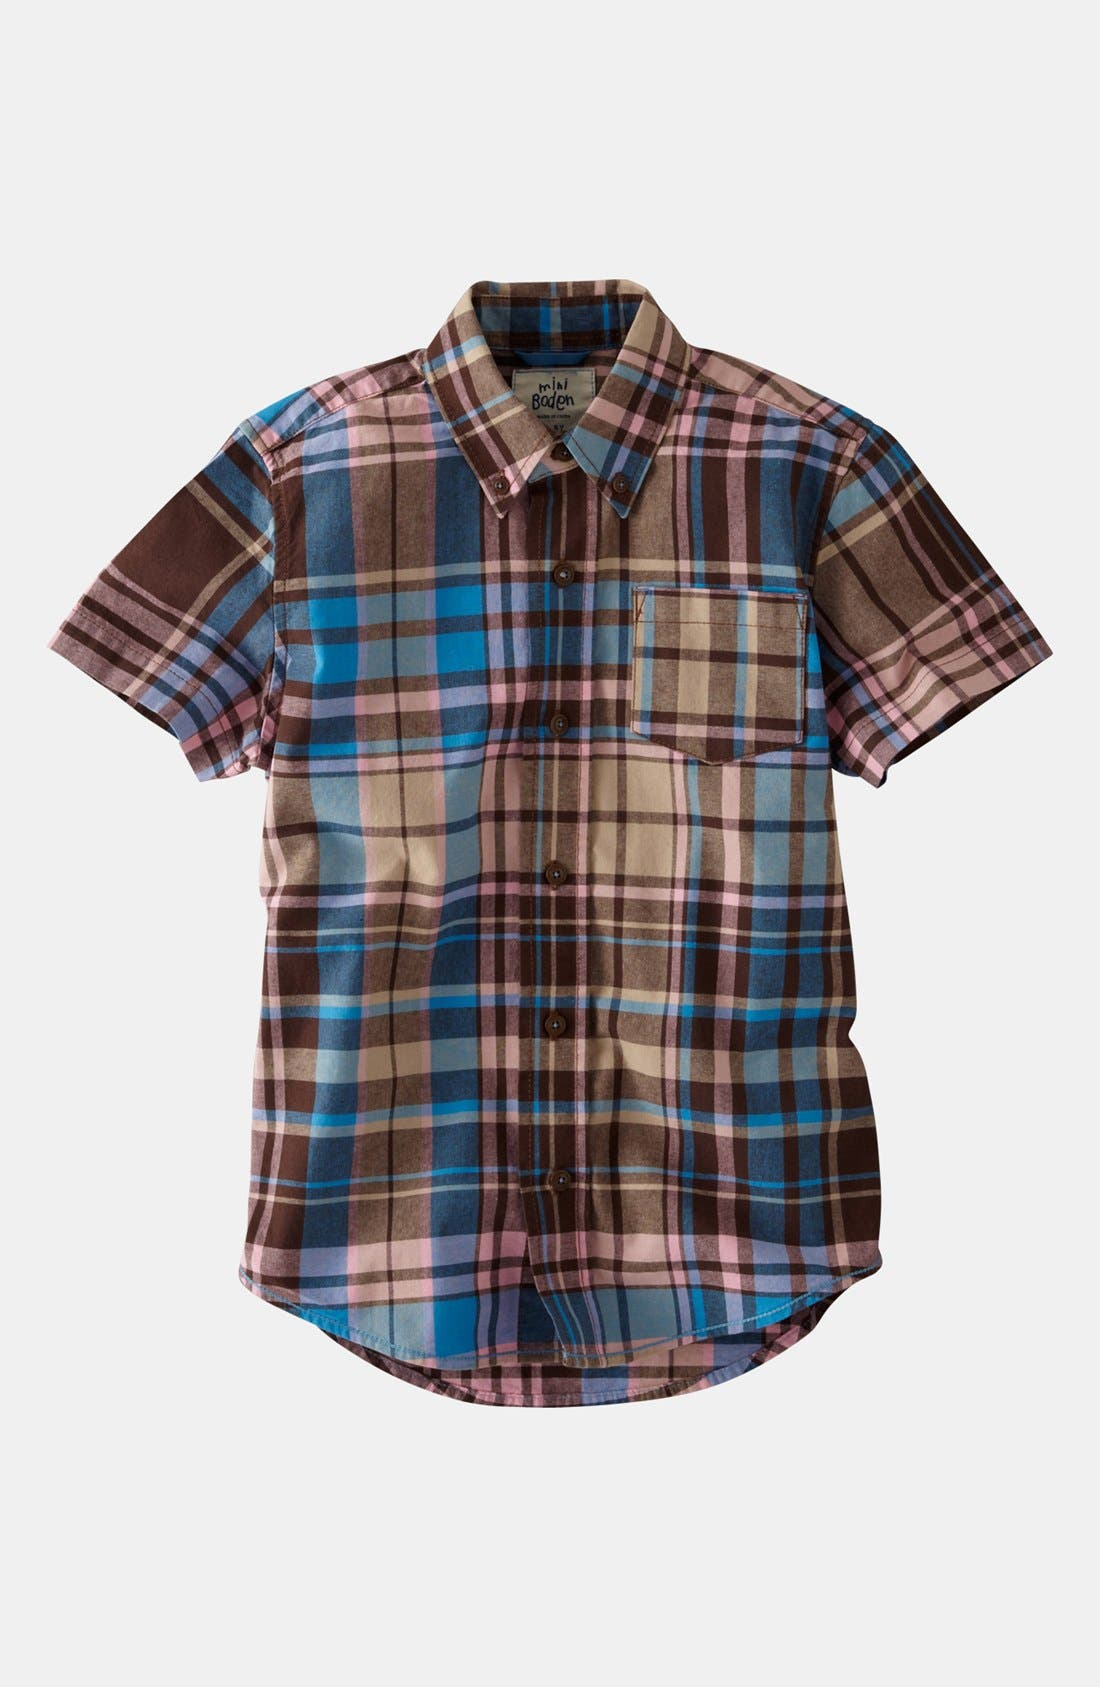 Alternate Image 1 Selected - Mini Boden 'Summer Check' Shirt (Little Boys & Big Boys)